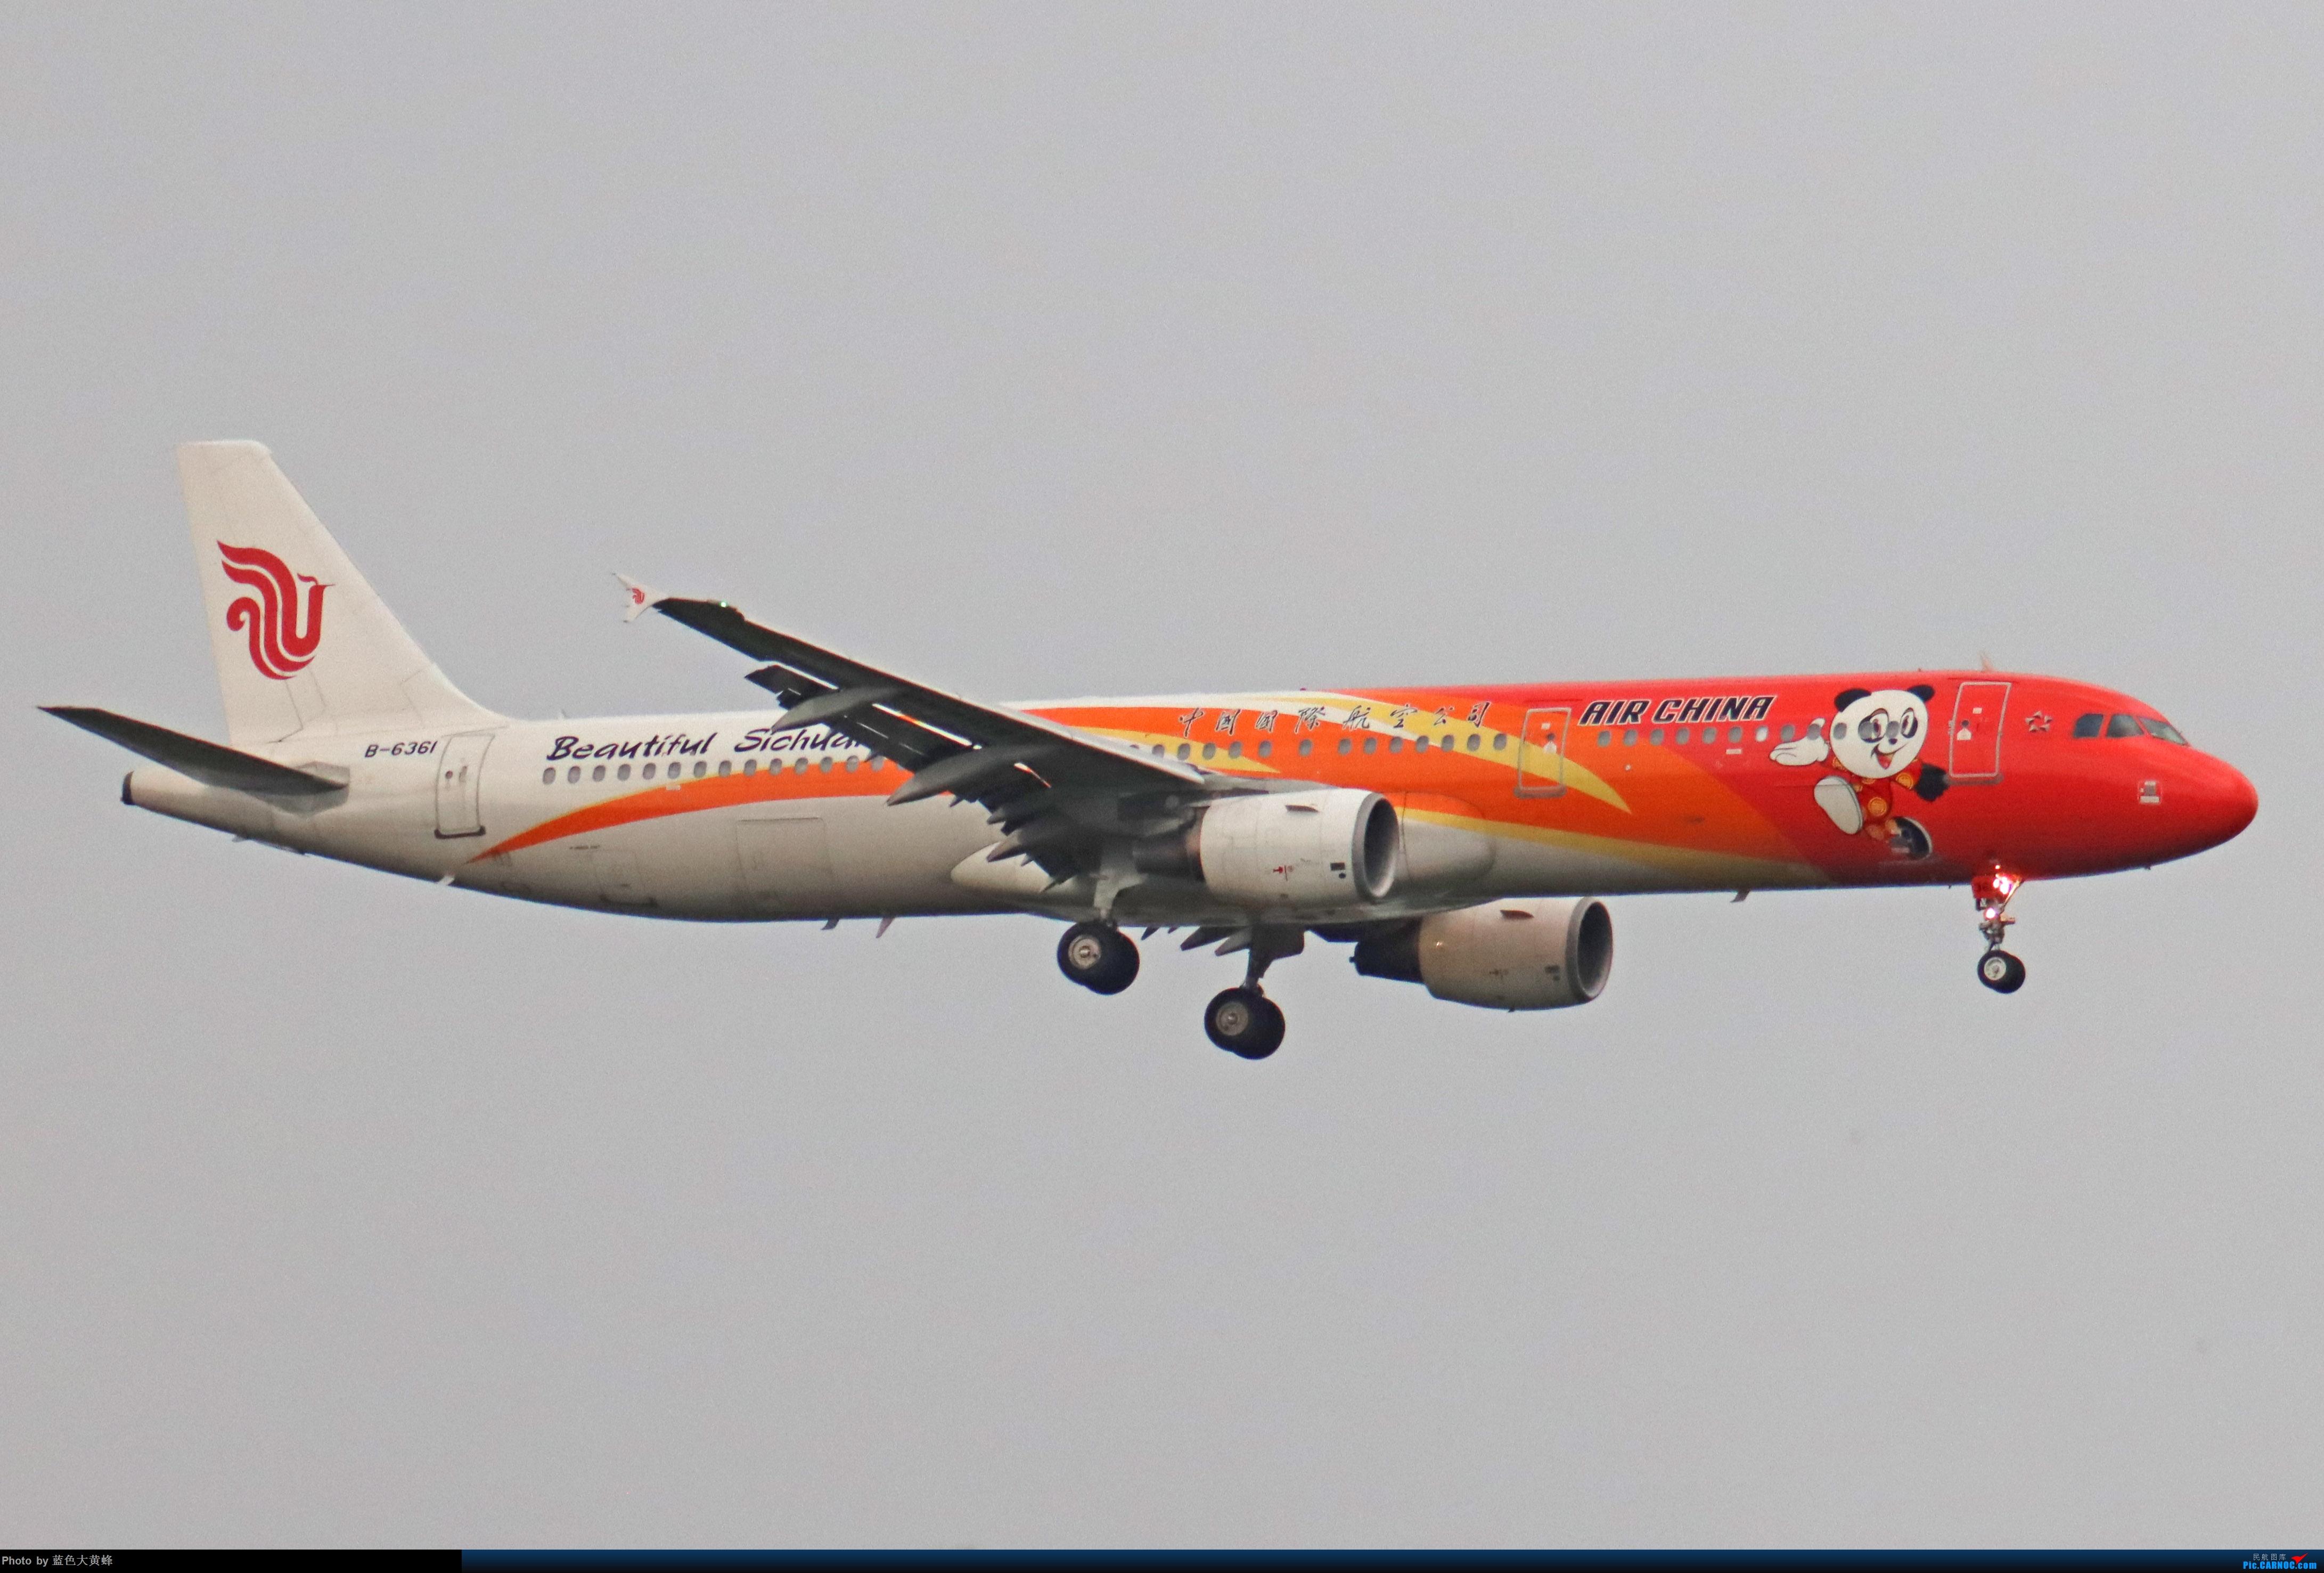 Re:[原创]2020.5.30PEK拍机,偶遇联邦的MD11给18R降落,实属罕见 AIRBUS A321-200 B-6361 中国北京首都国际机场